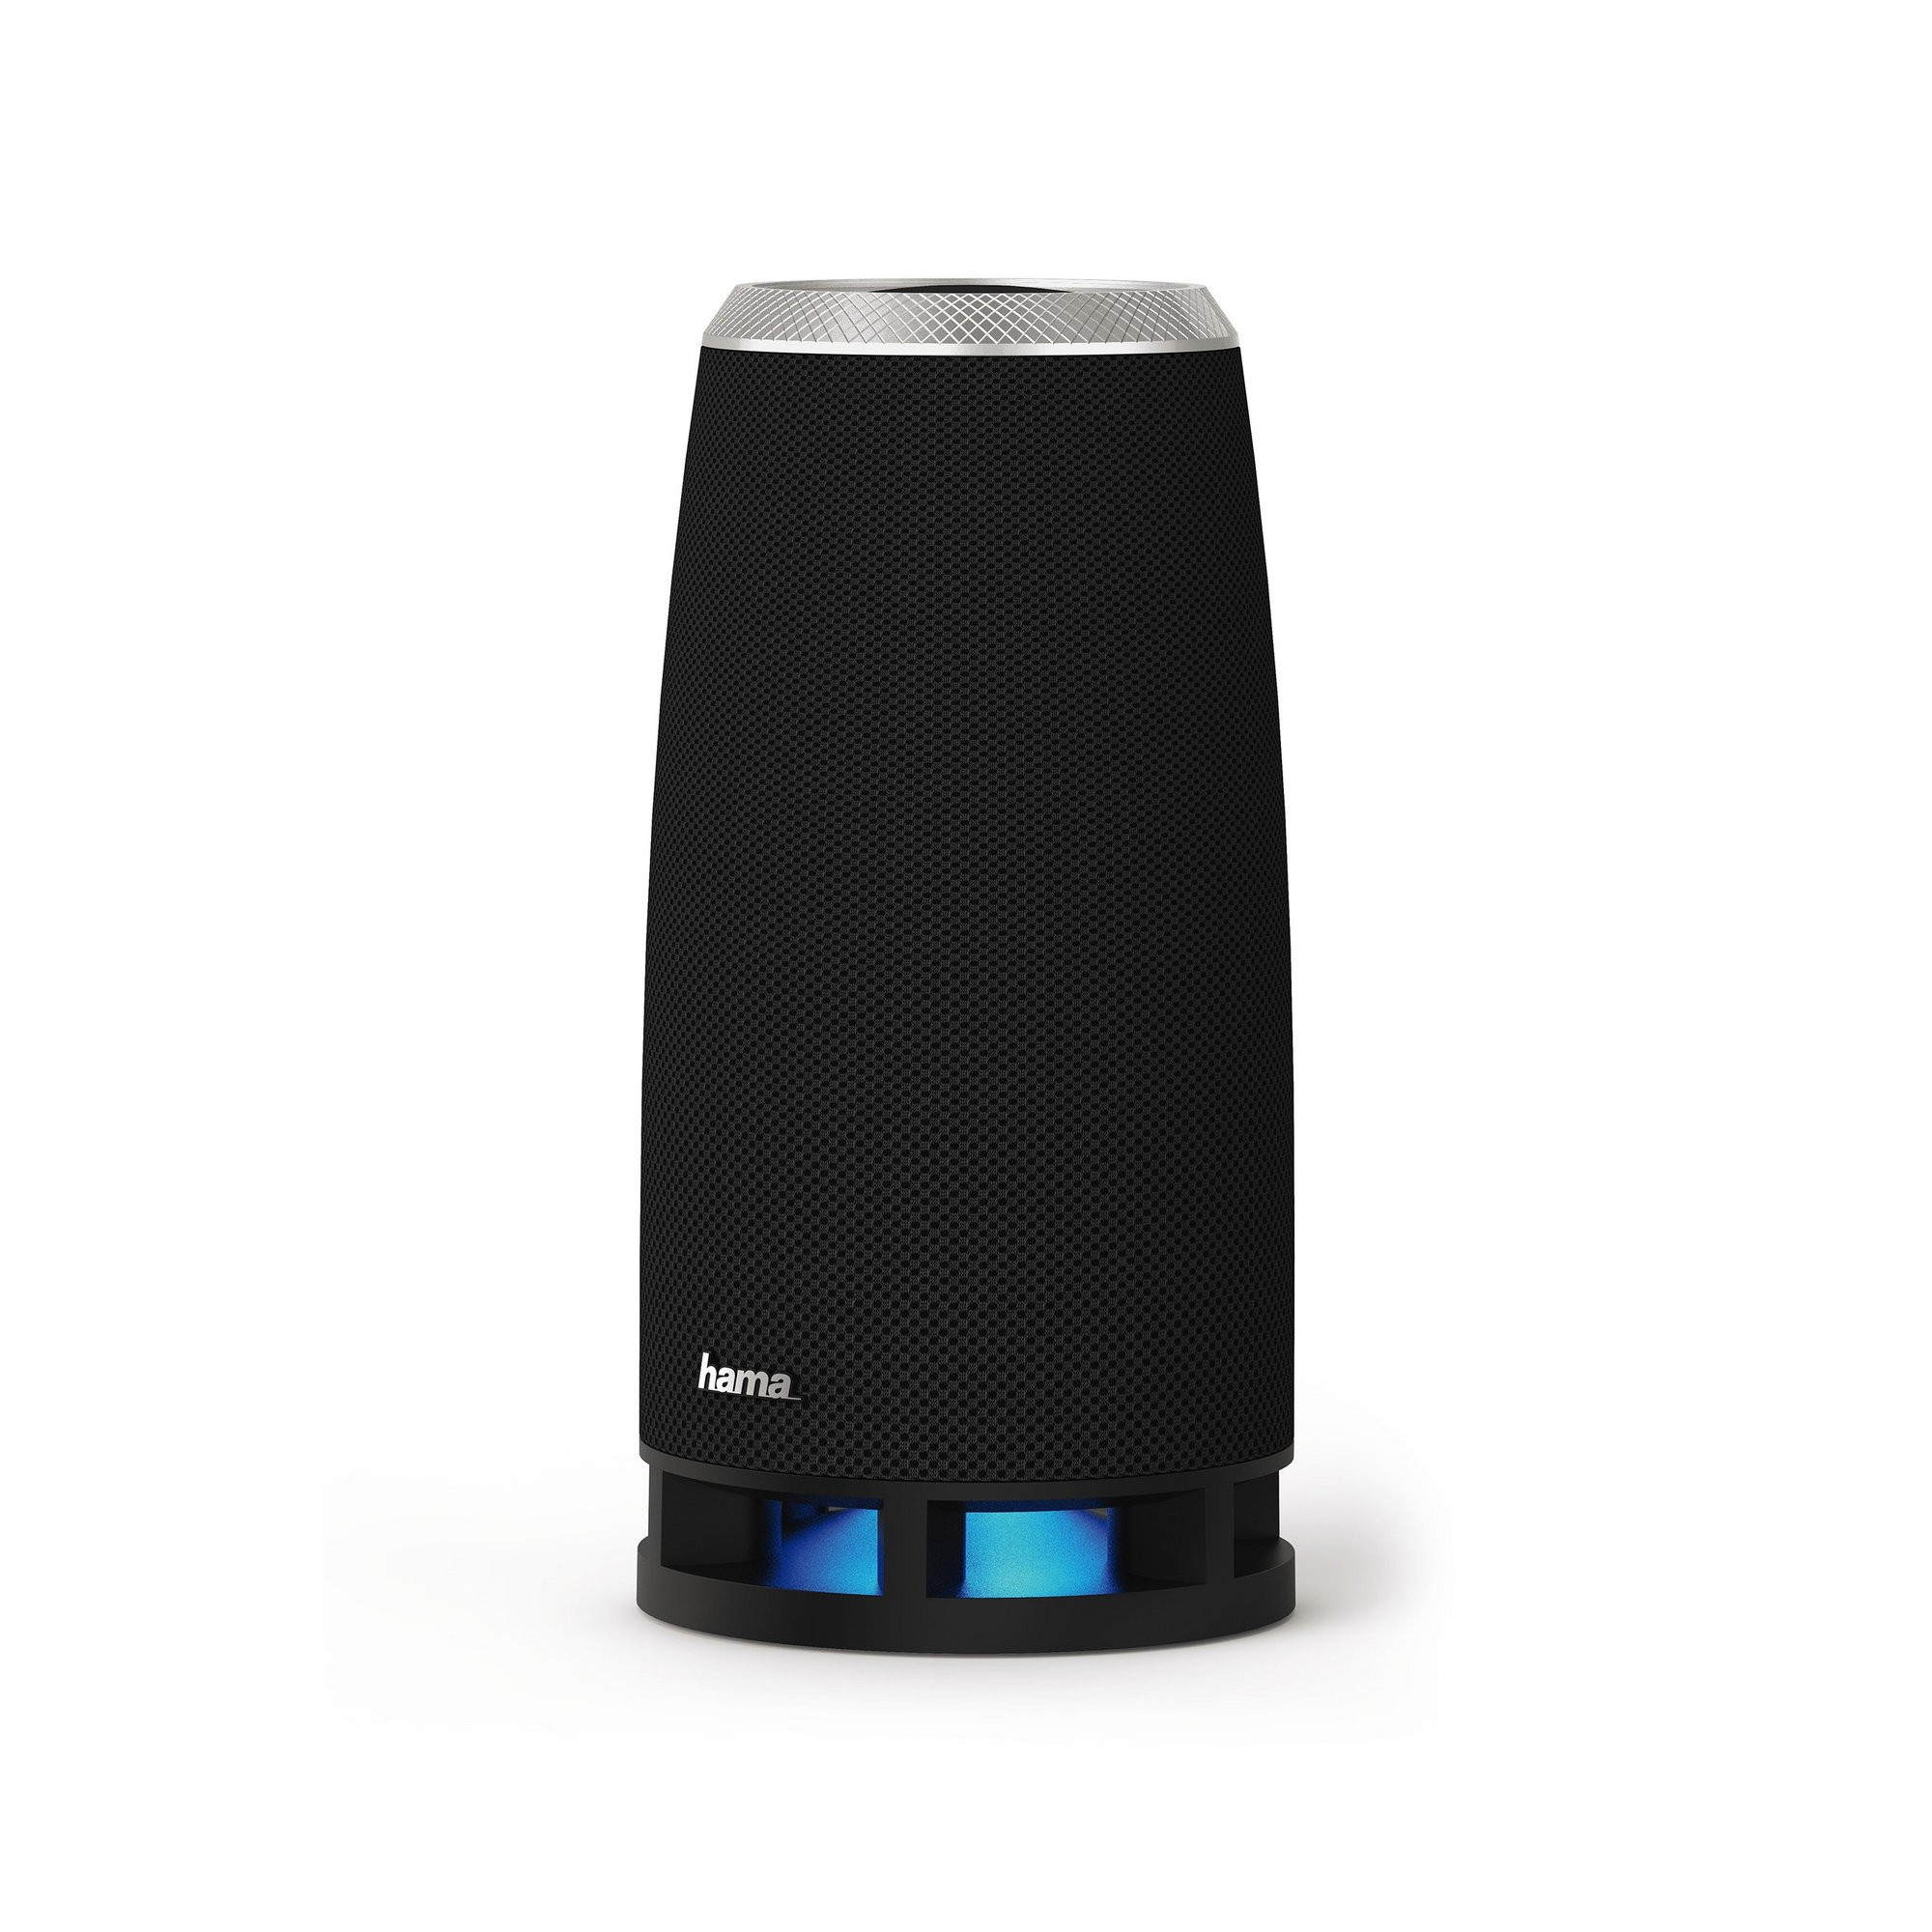 Image of Hama Soundcup-Z Mobile Bluetooth Speaker